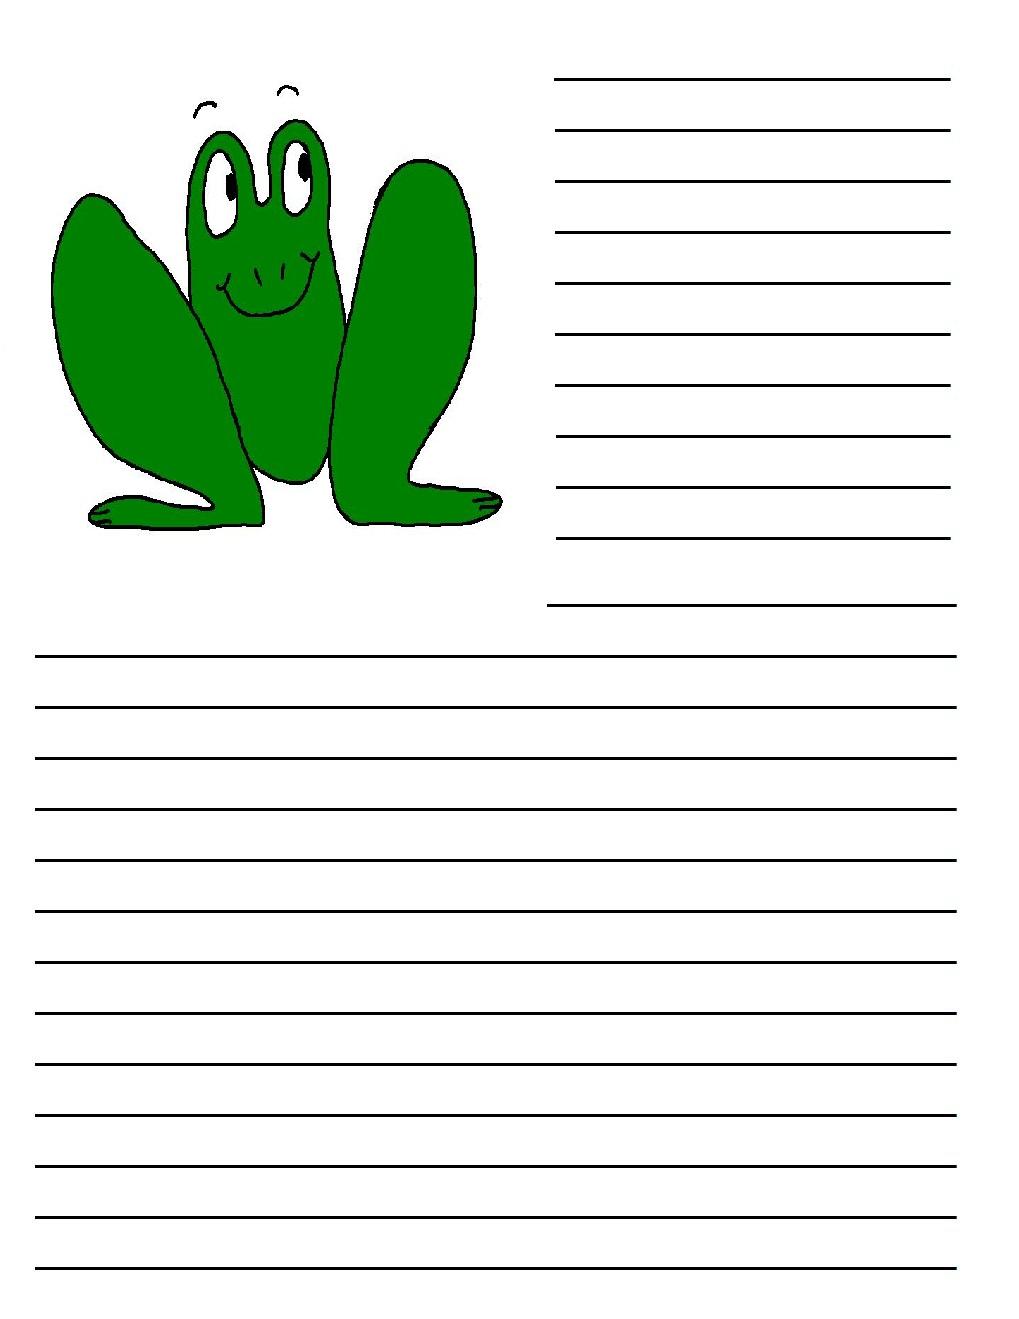 Print writing paper